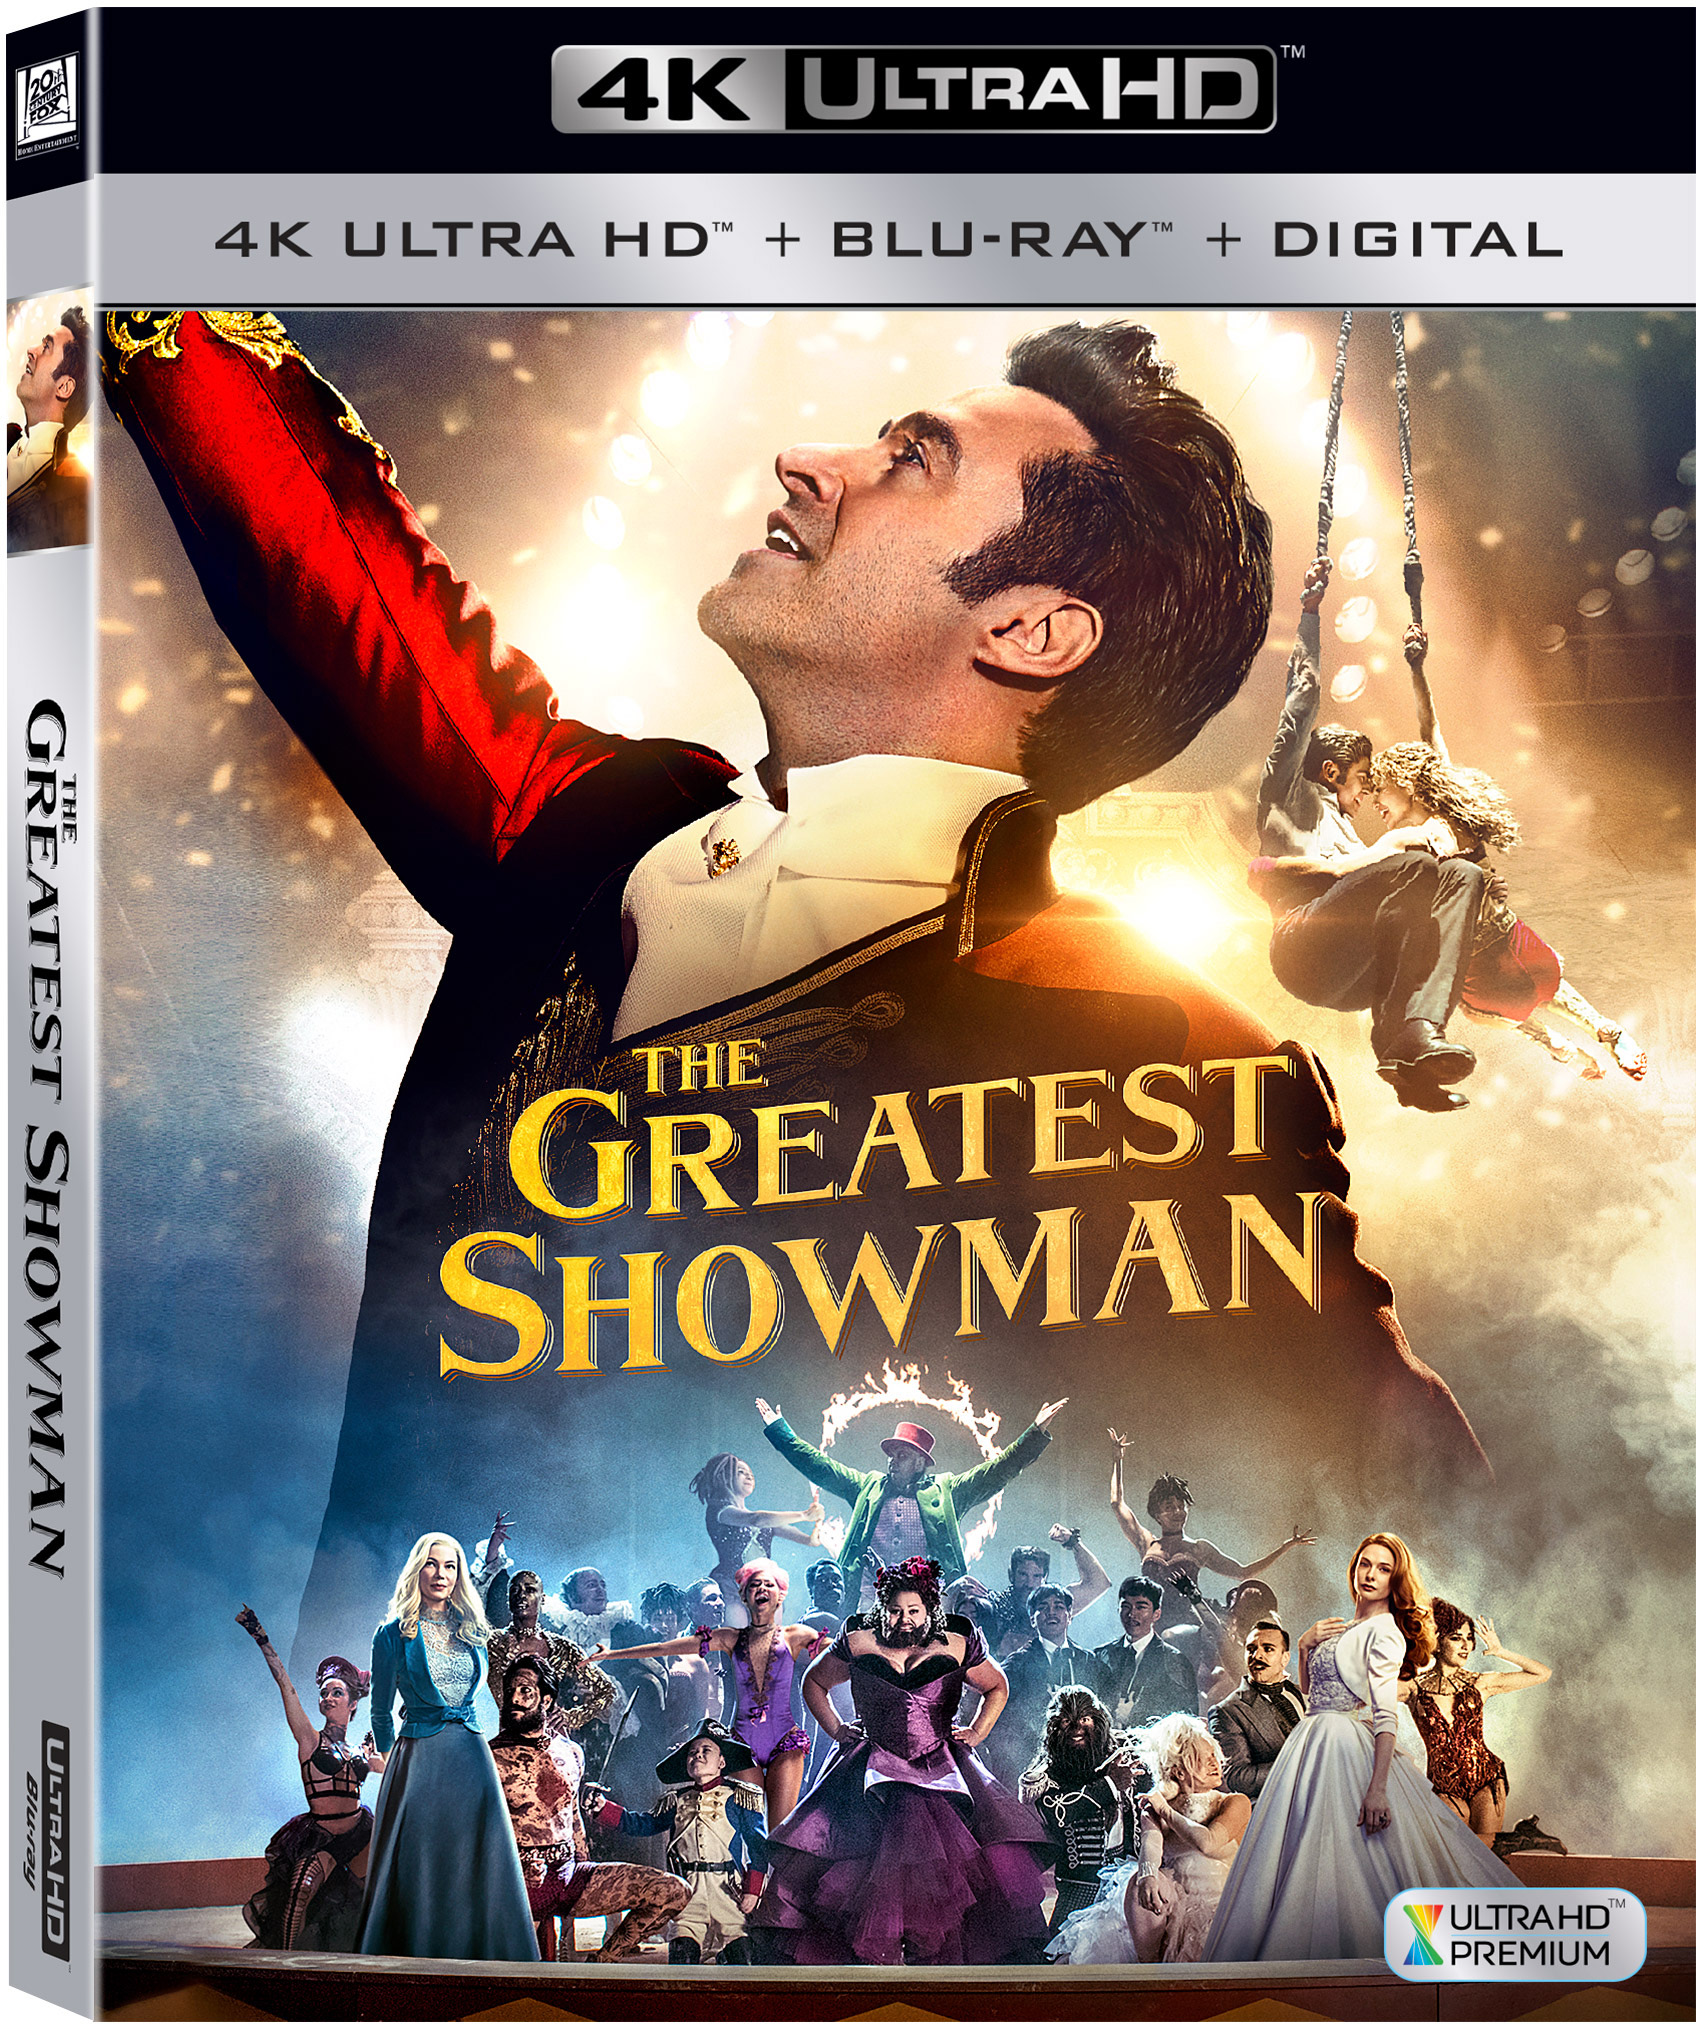 The Greatest Showman (4K Ultra HD + Blu-ray + Digital)